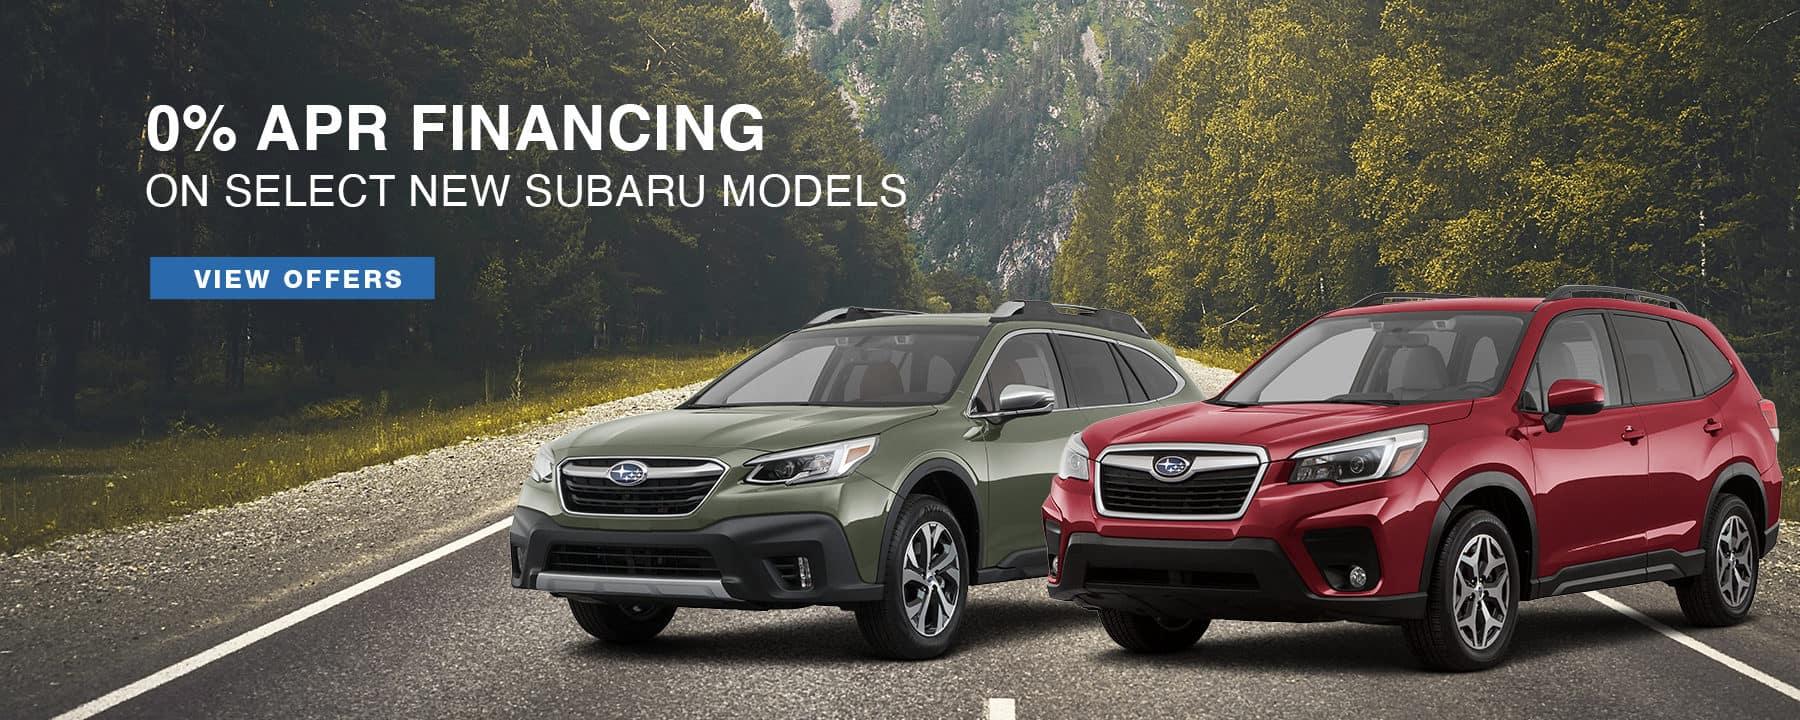 Homepage-Banner-Subaru-m6-0apr